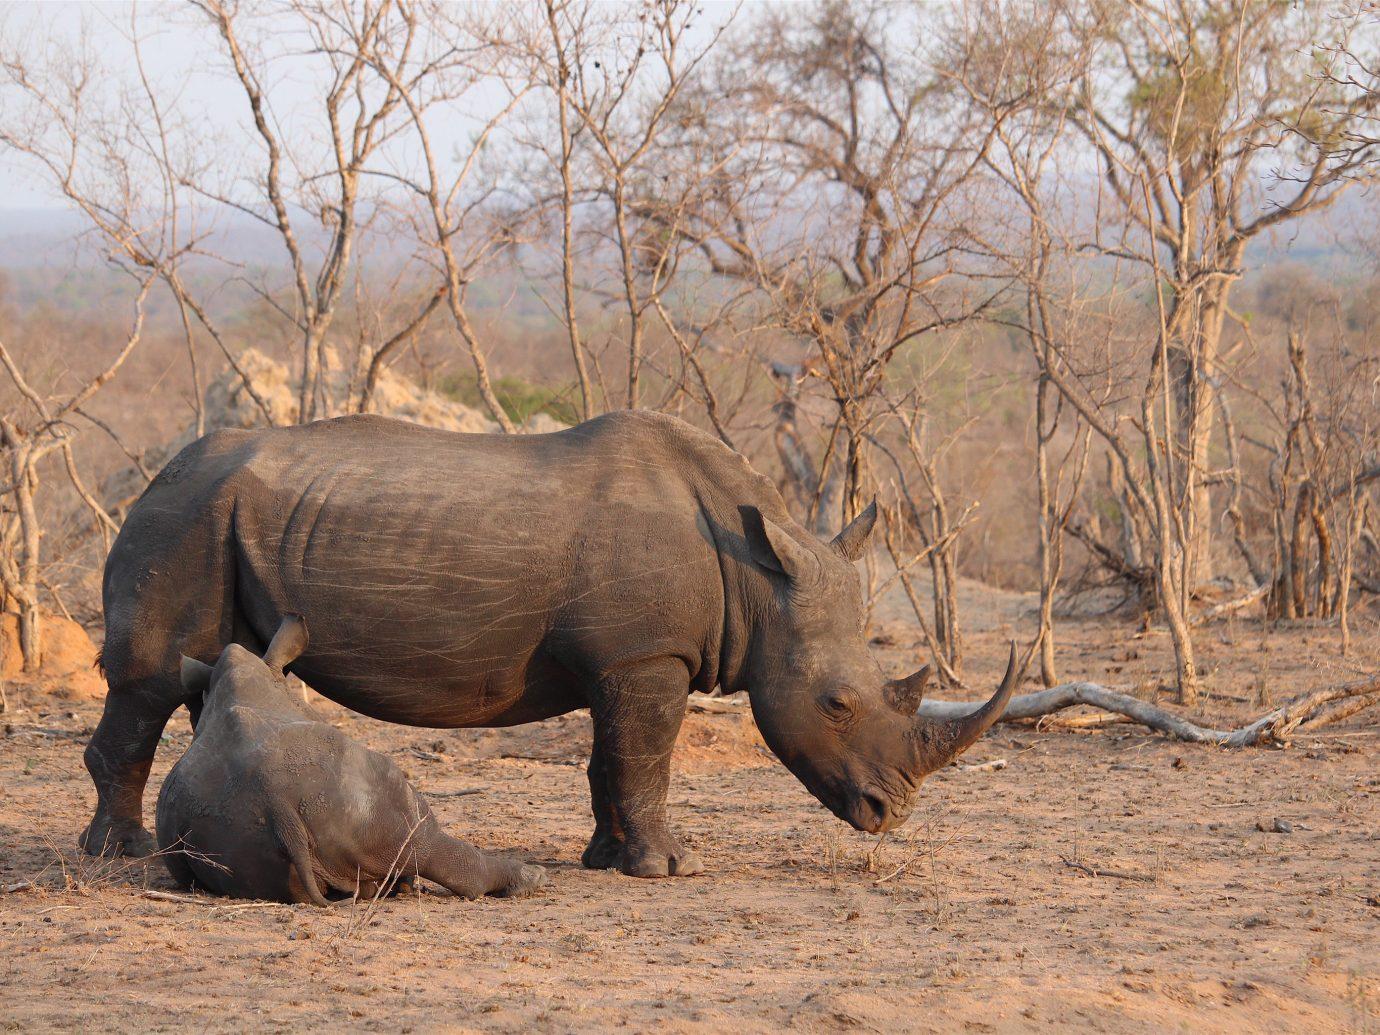 Outdoors + Adventure Safaris Trip Ideas tree animal outdoor mammal ground rhinoceros Wildlife fauna indian elephant savanna Safari baby Adventure dry dirt Forest